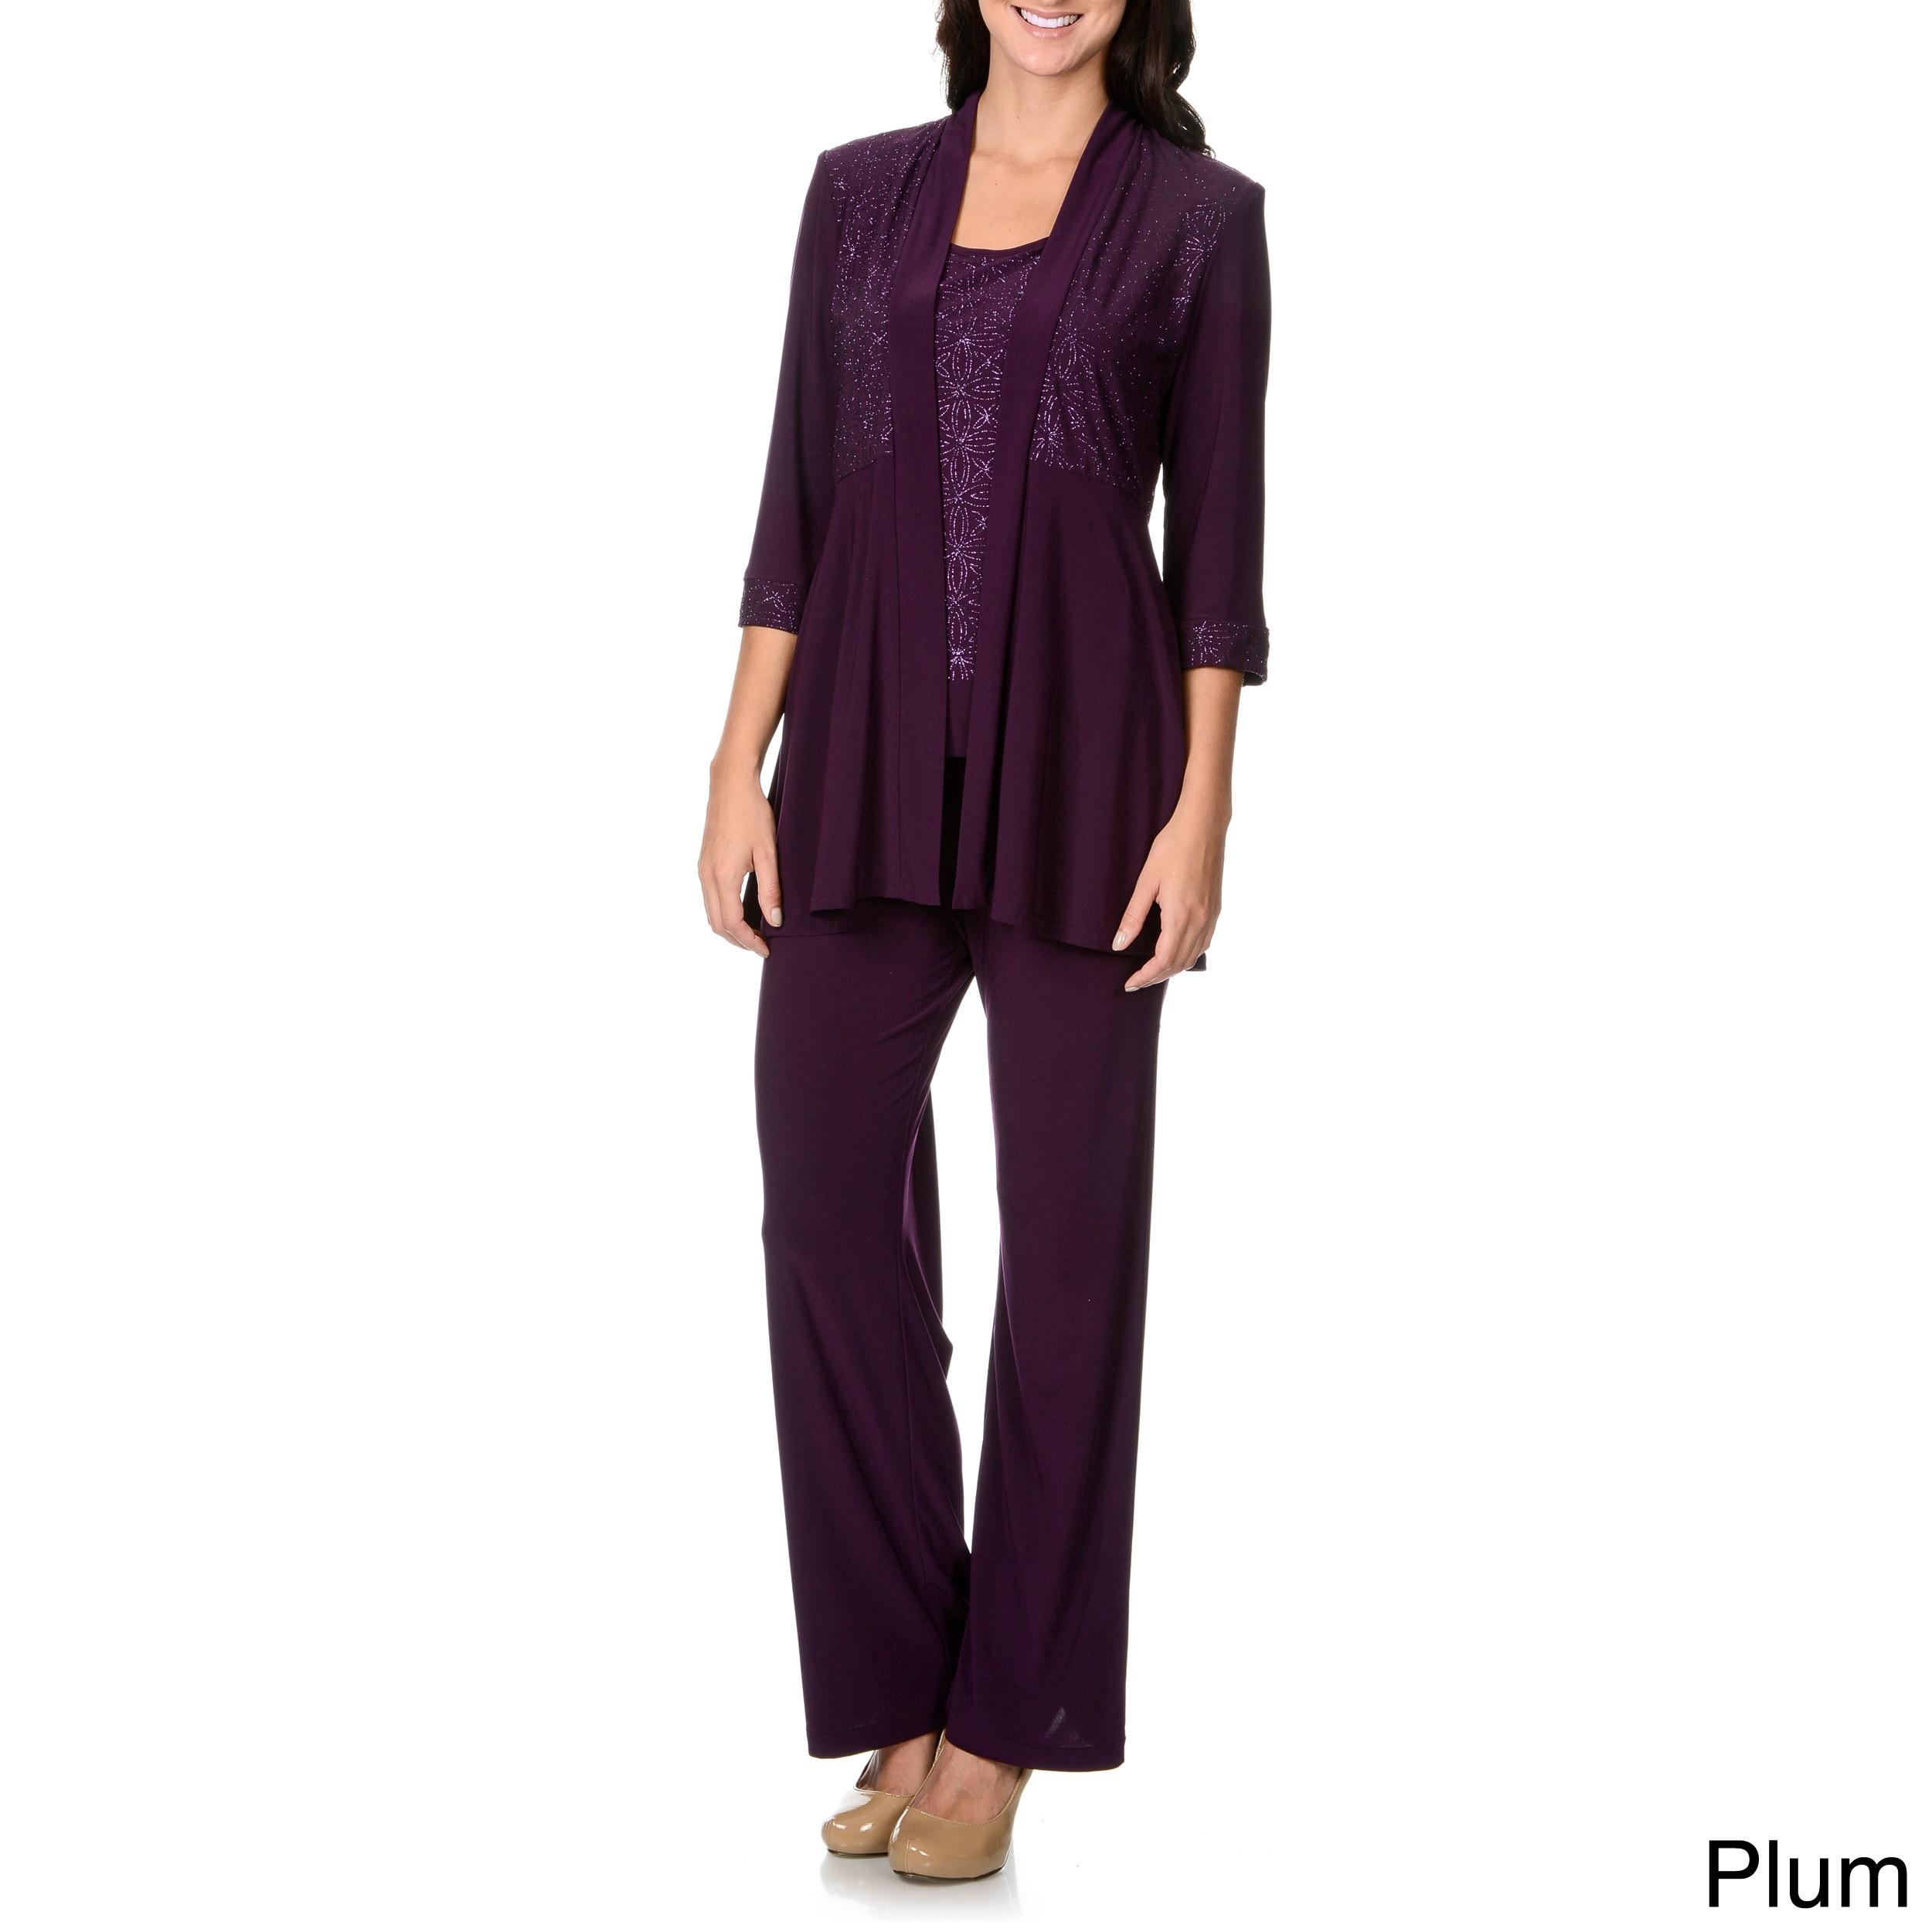 df61450d2a13 Shop R M Richards Women s Mock 2-piece Pant Set - Free Shipping ...